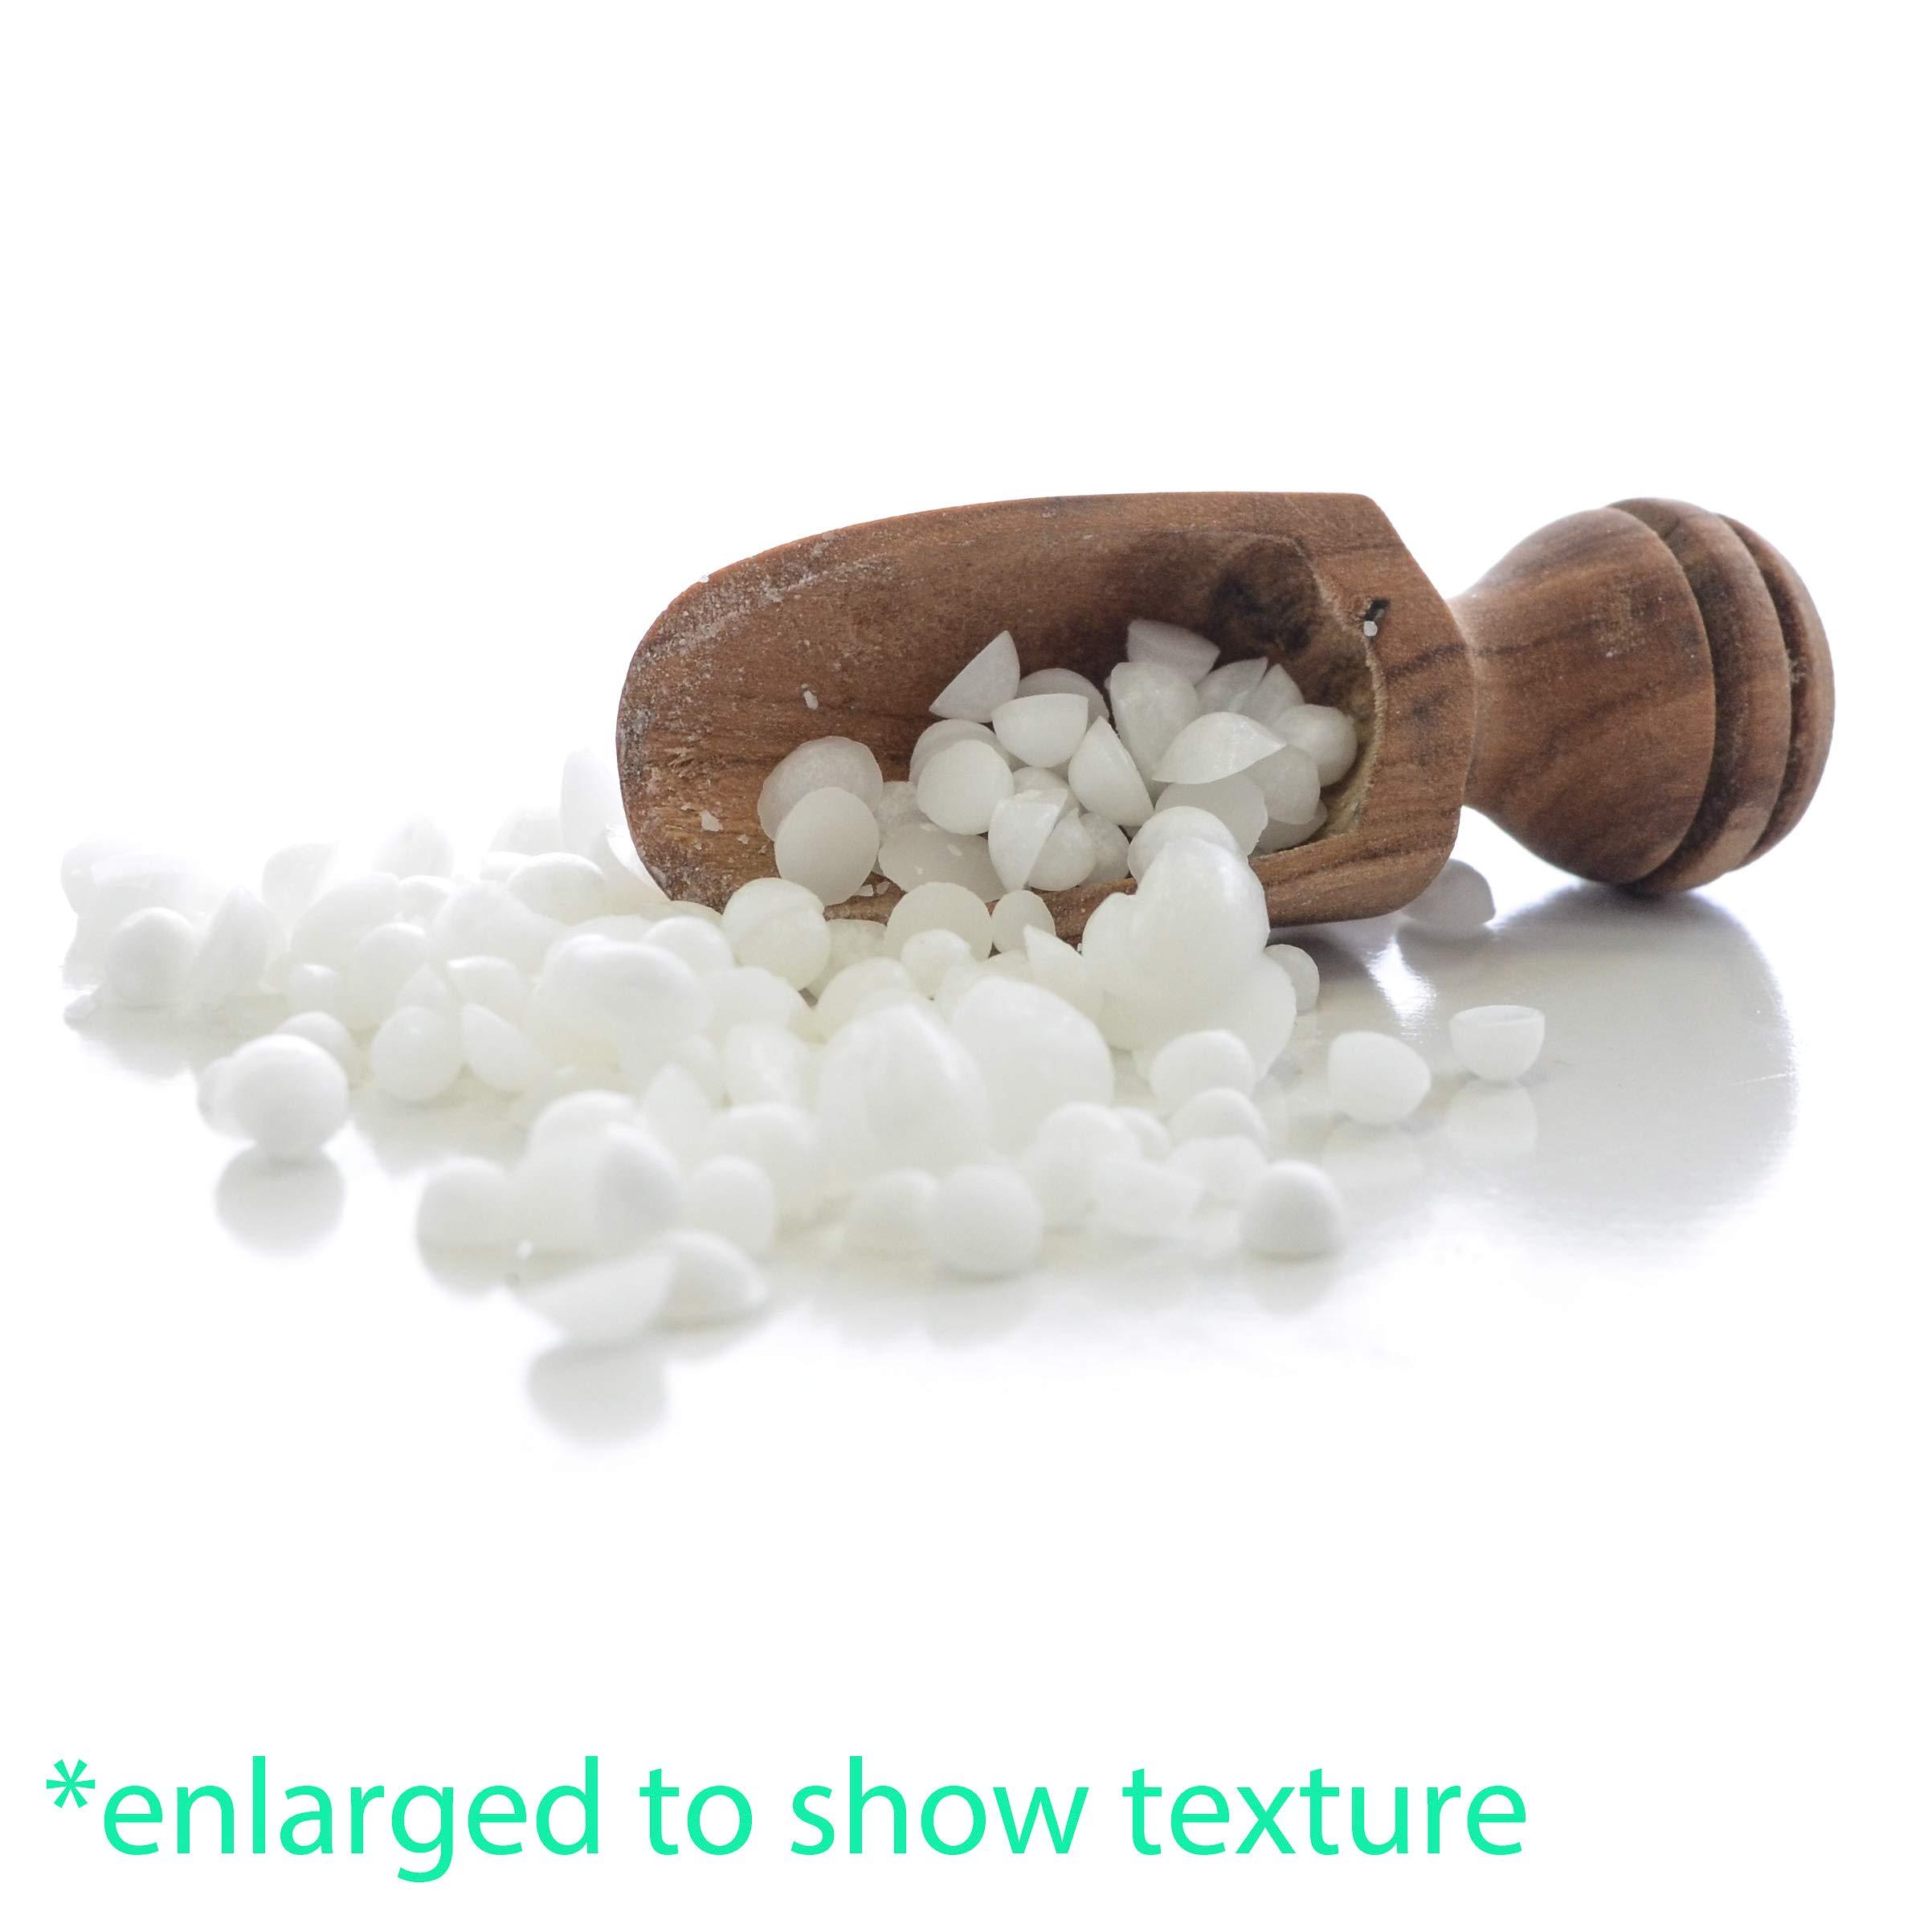 Milliard Non-GMO Emulsifying Wax Pastilles NF – 32 OZ. Resealable Freshness Storage Bag